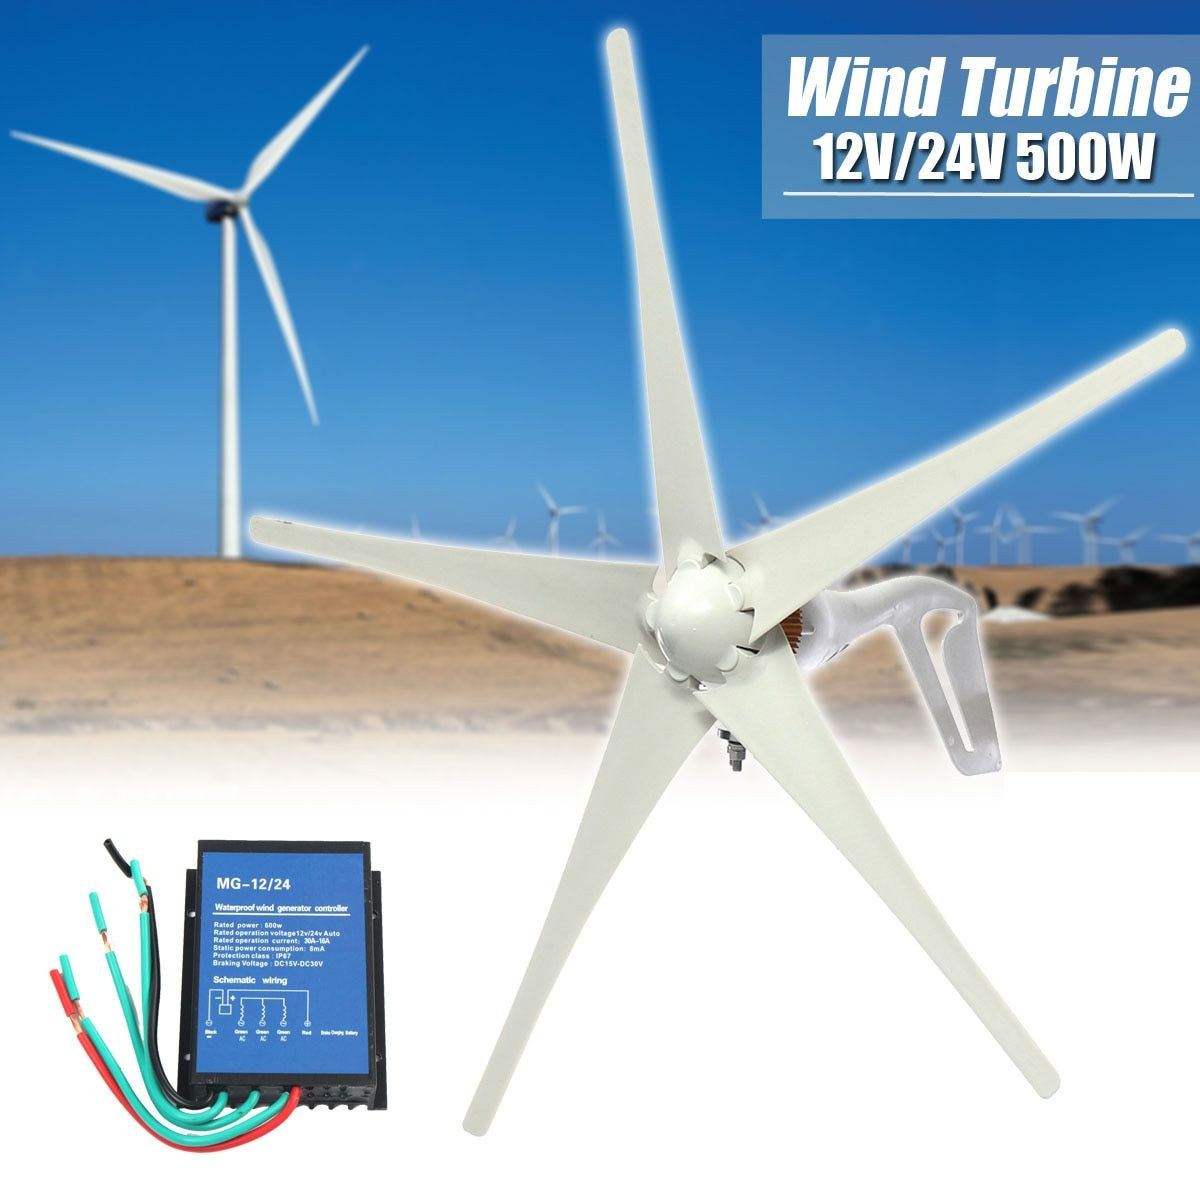 500 watt 12 v Fünf Wind Klingen Miniatur Horizontale Wind Turbinen Wind Generator Mit Controller Fit für Wohn Hause